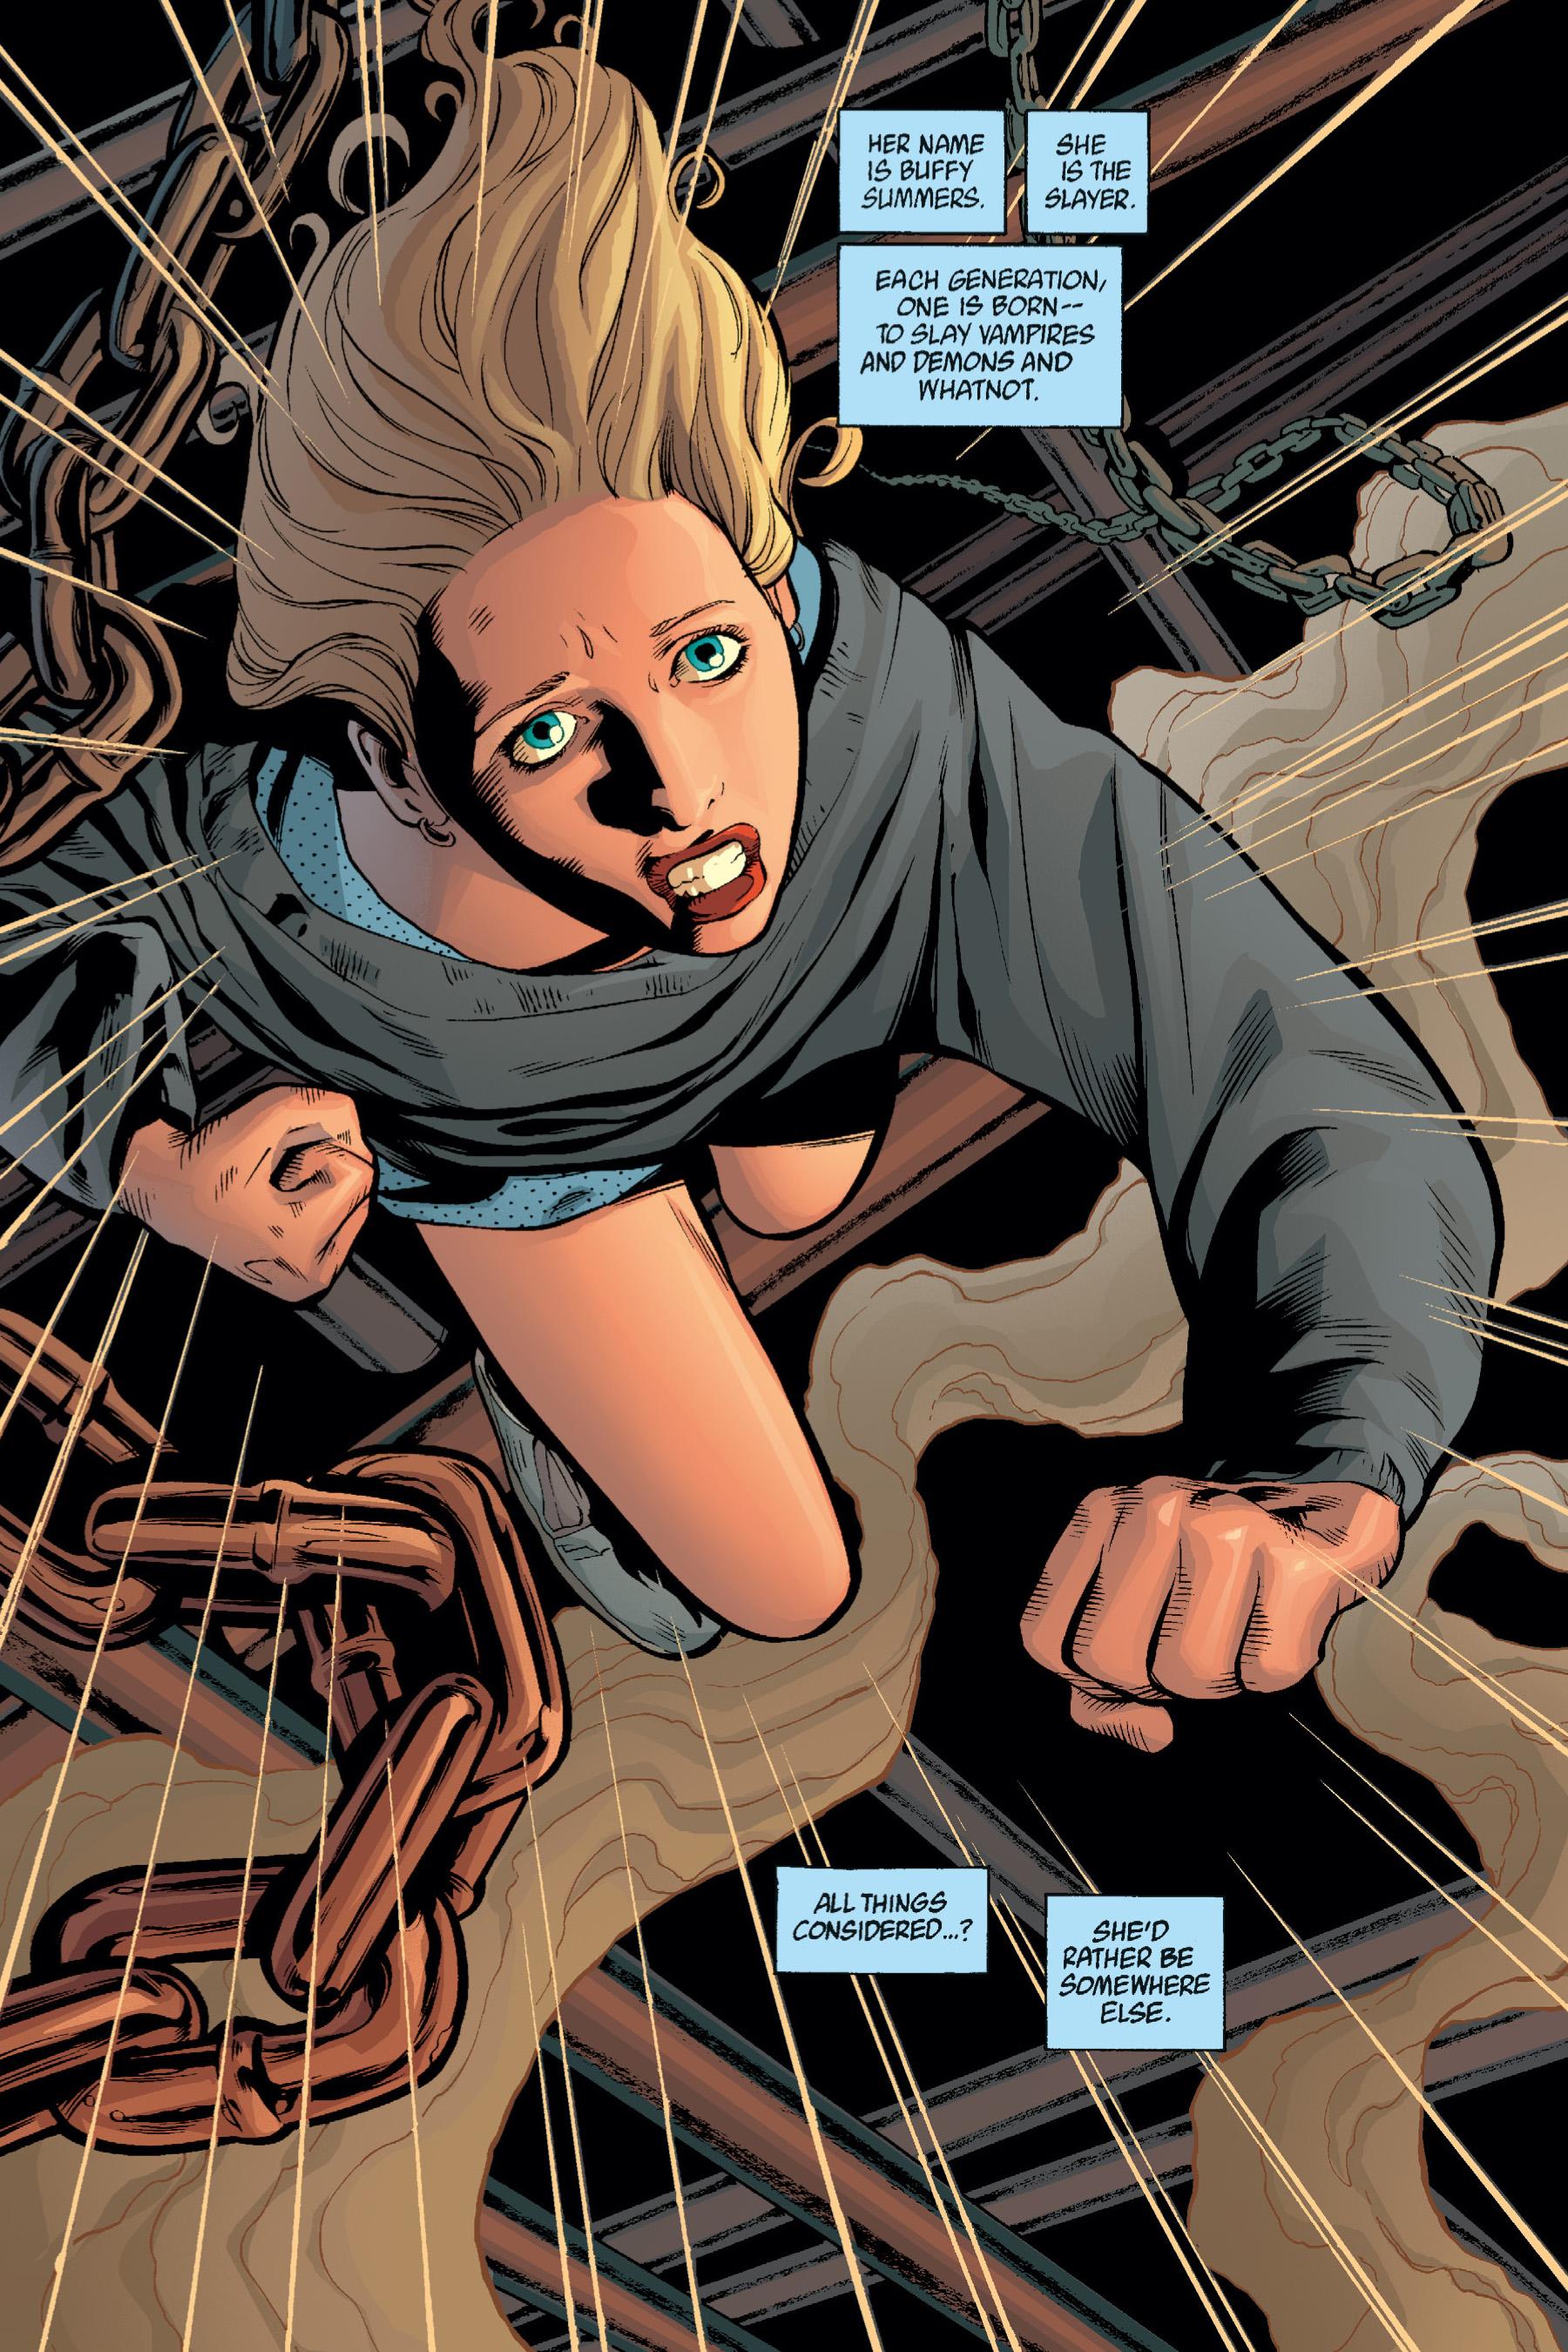 Read online Buffy the Vampire Slayer: Omnibus comic -  Issue # TPB 1 - 280